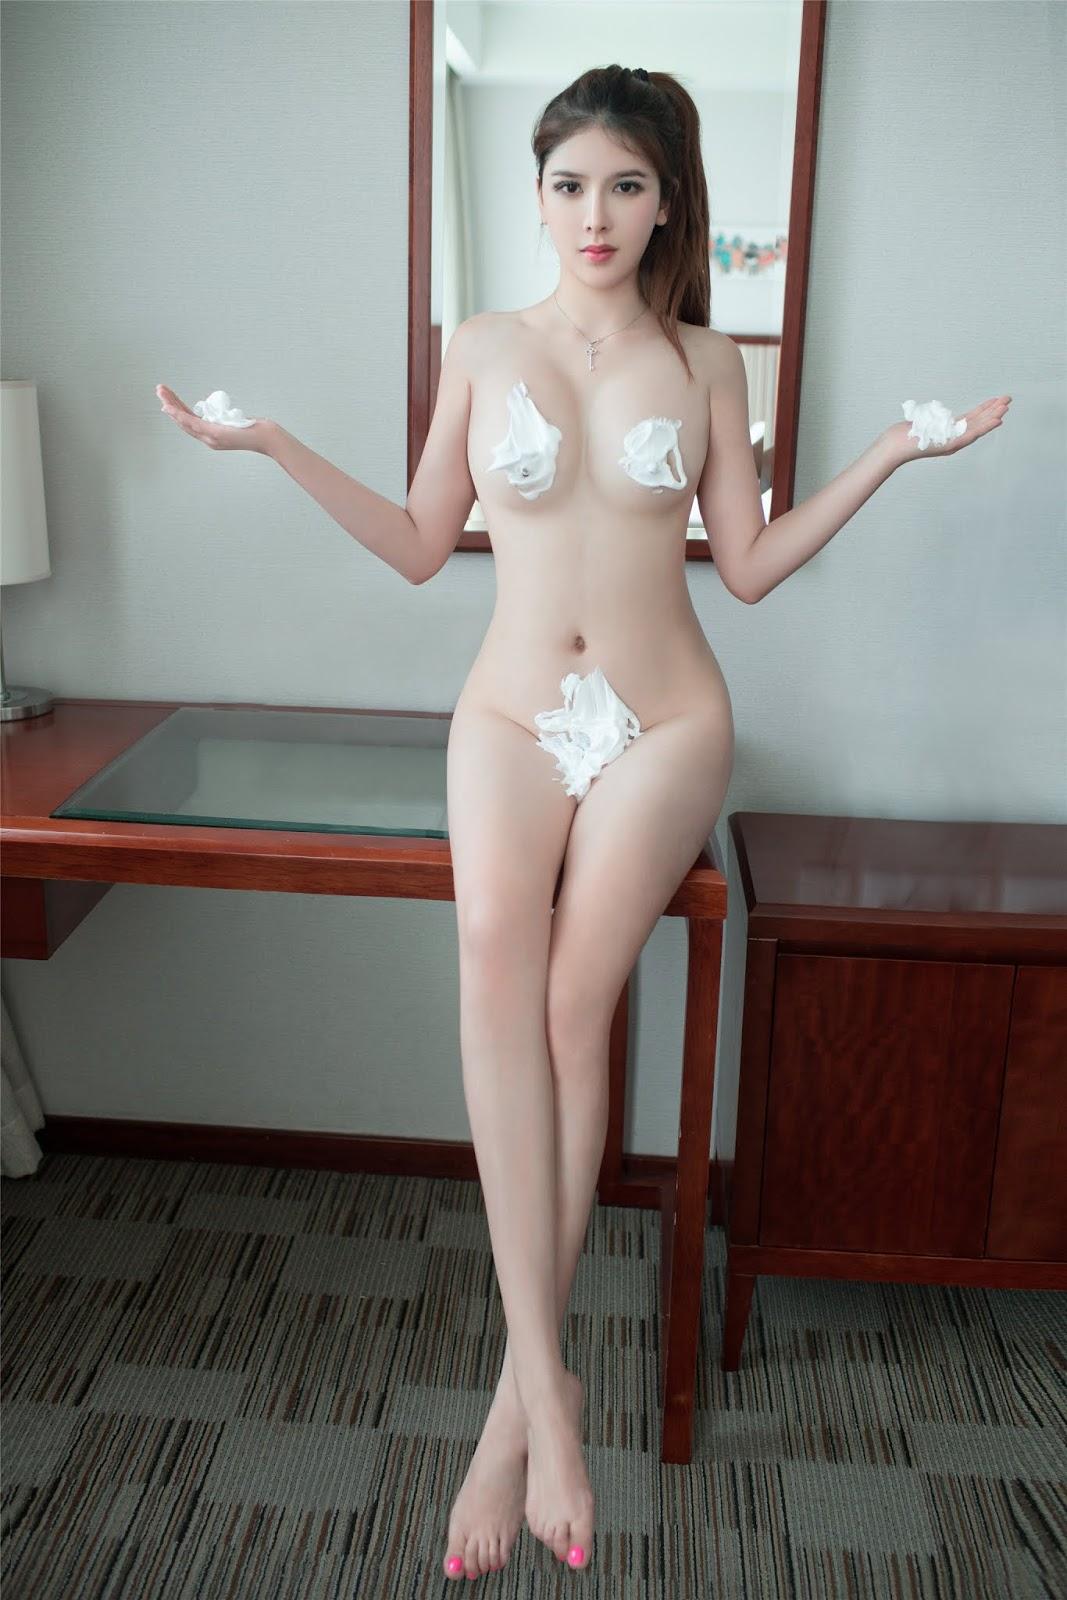 BoolWowGirls%2B%252817%2529 - Li LiSha 李丽莎 Beautiful Nude Model